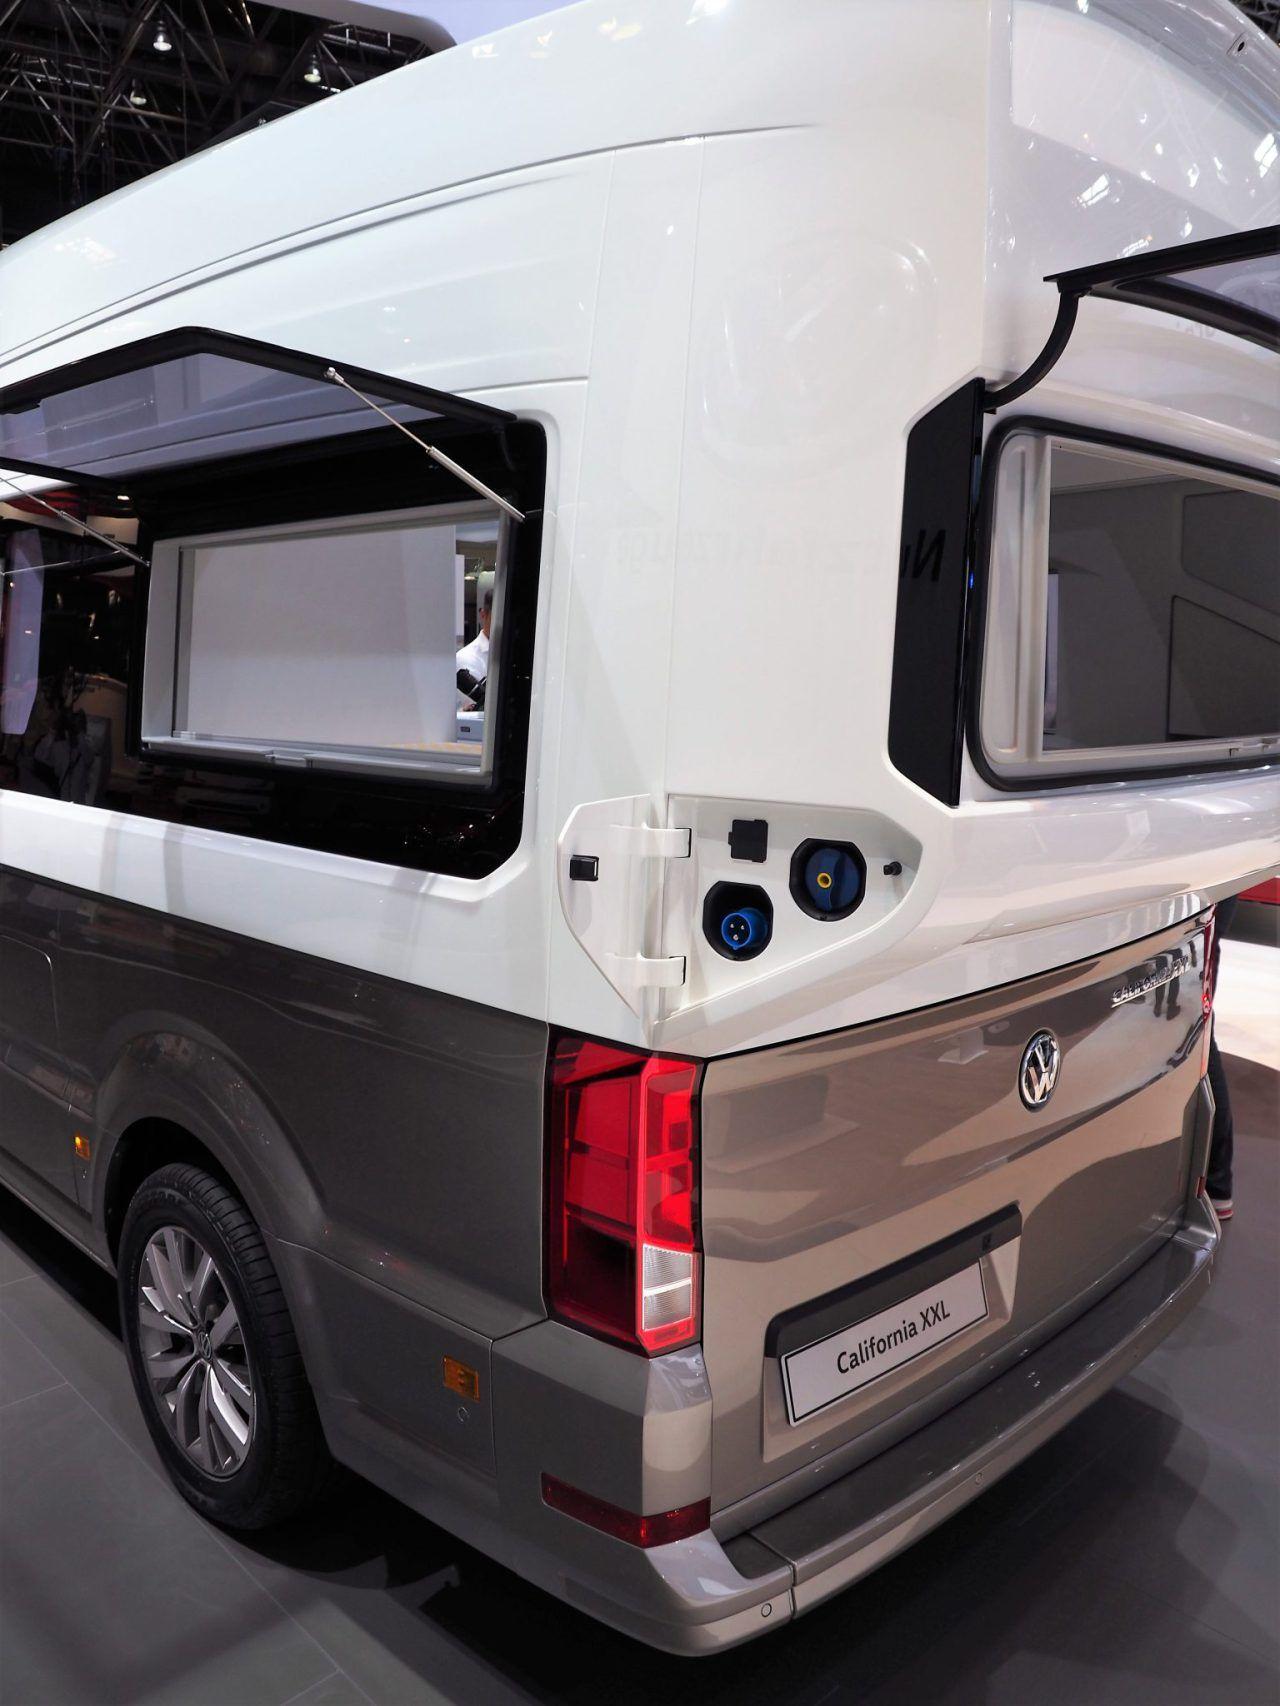 VW California XXL – Studie auf VW Crafter Basis › Familienurlaub